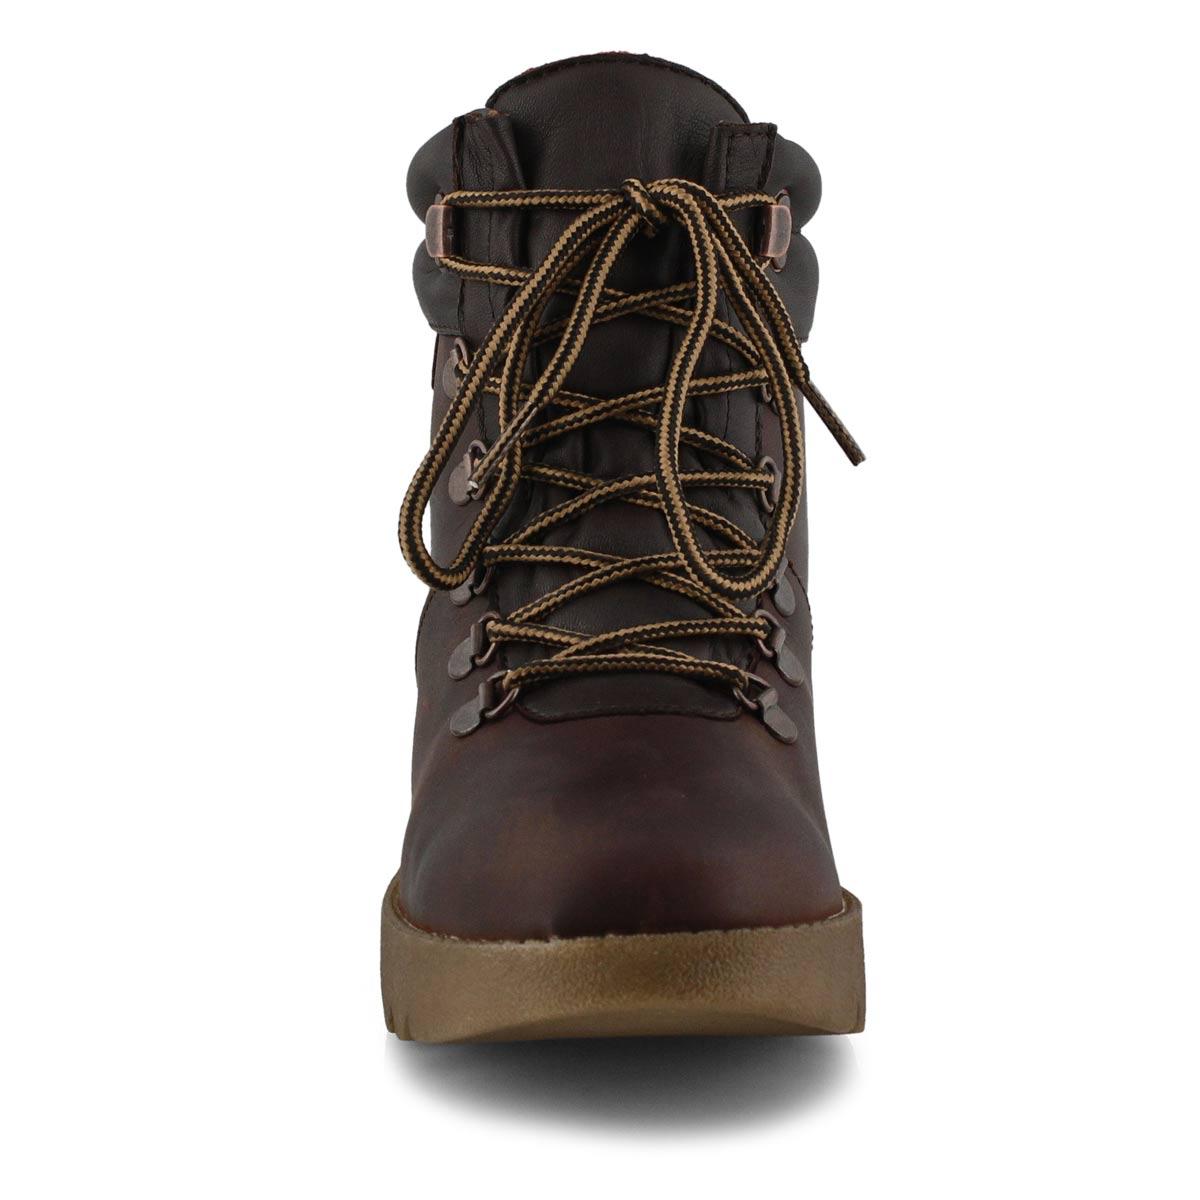 Women's PRESCOTT cask waterproof winter boots